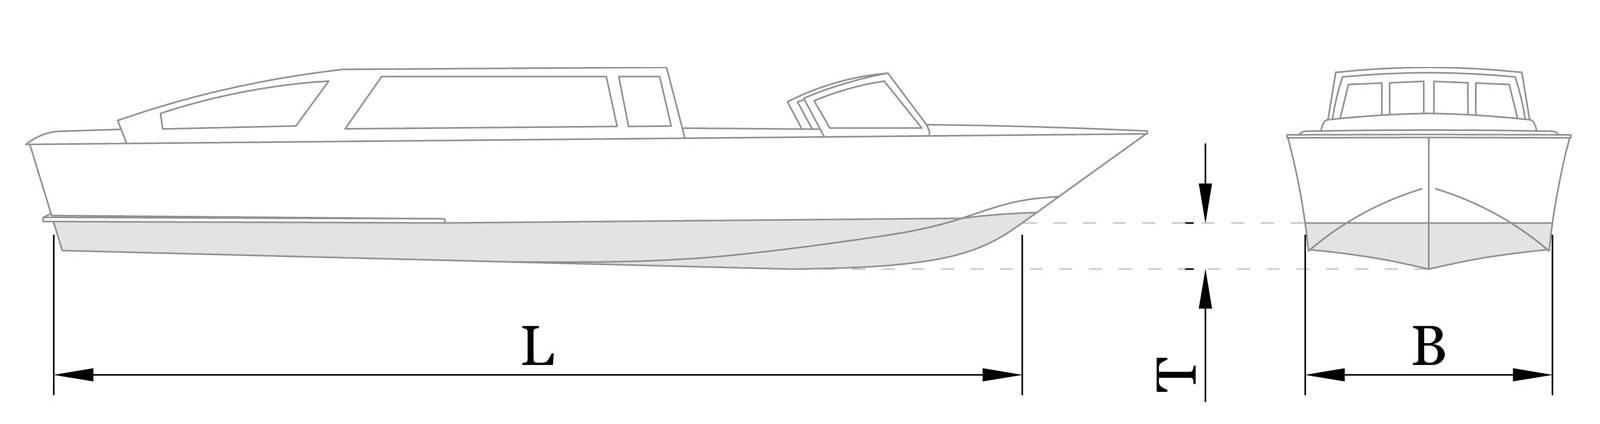 boat-lxbxt